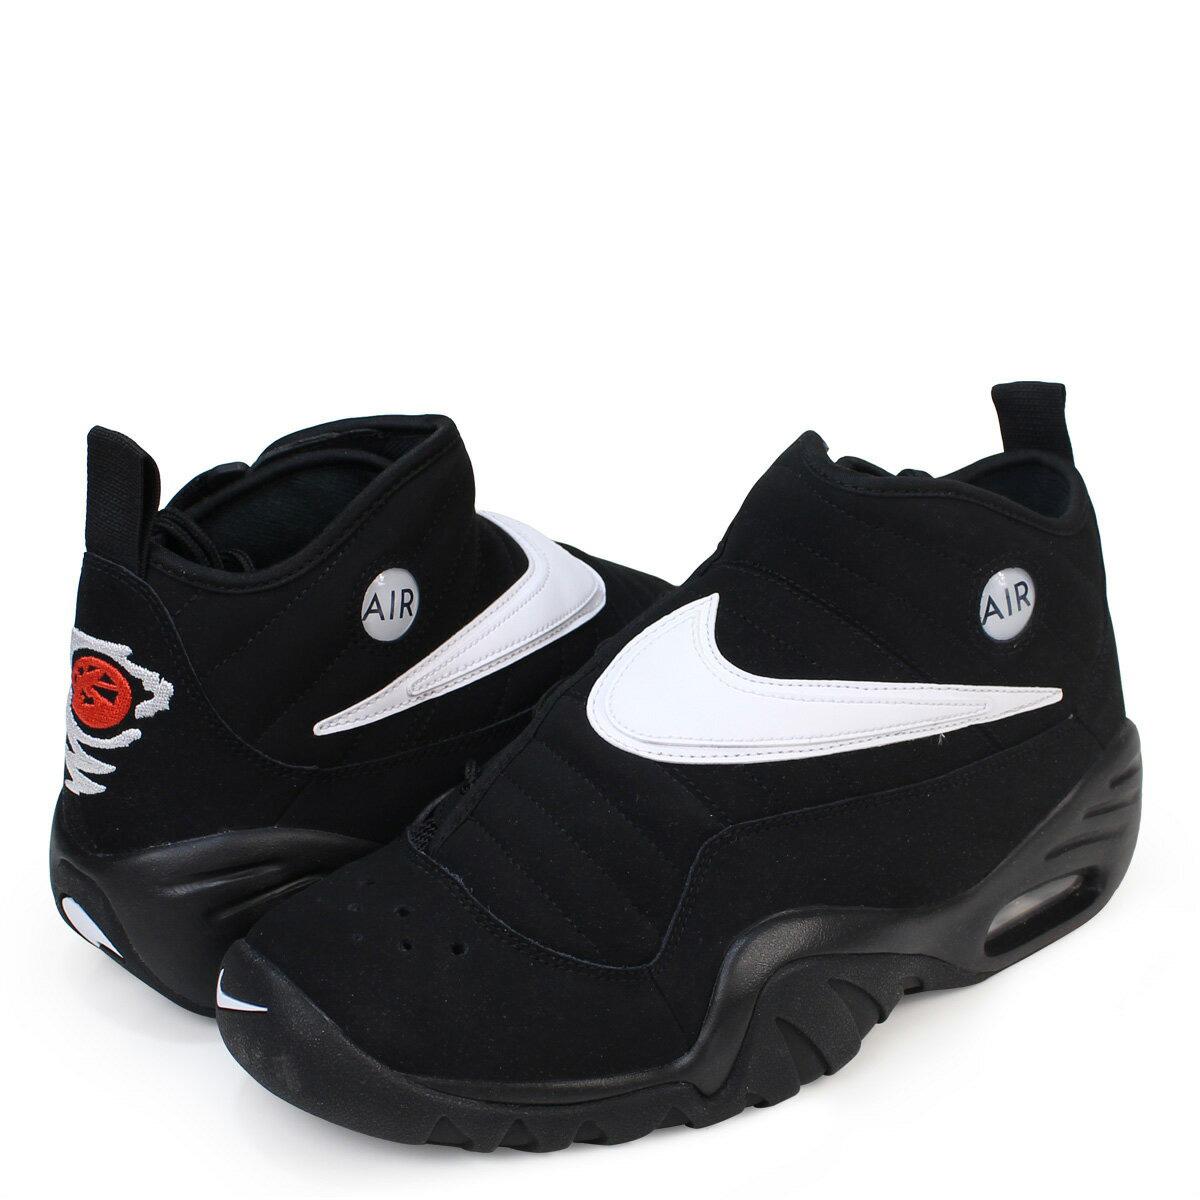 separation shoes 7c91b 4a8c3 NIKE Nike air shake sneakers AIR SHAKE NDESTRUKT エアシェイクインデストラクト 880,869-001  men s shoes black  load planned Shinnyu load in reservation ...